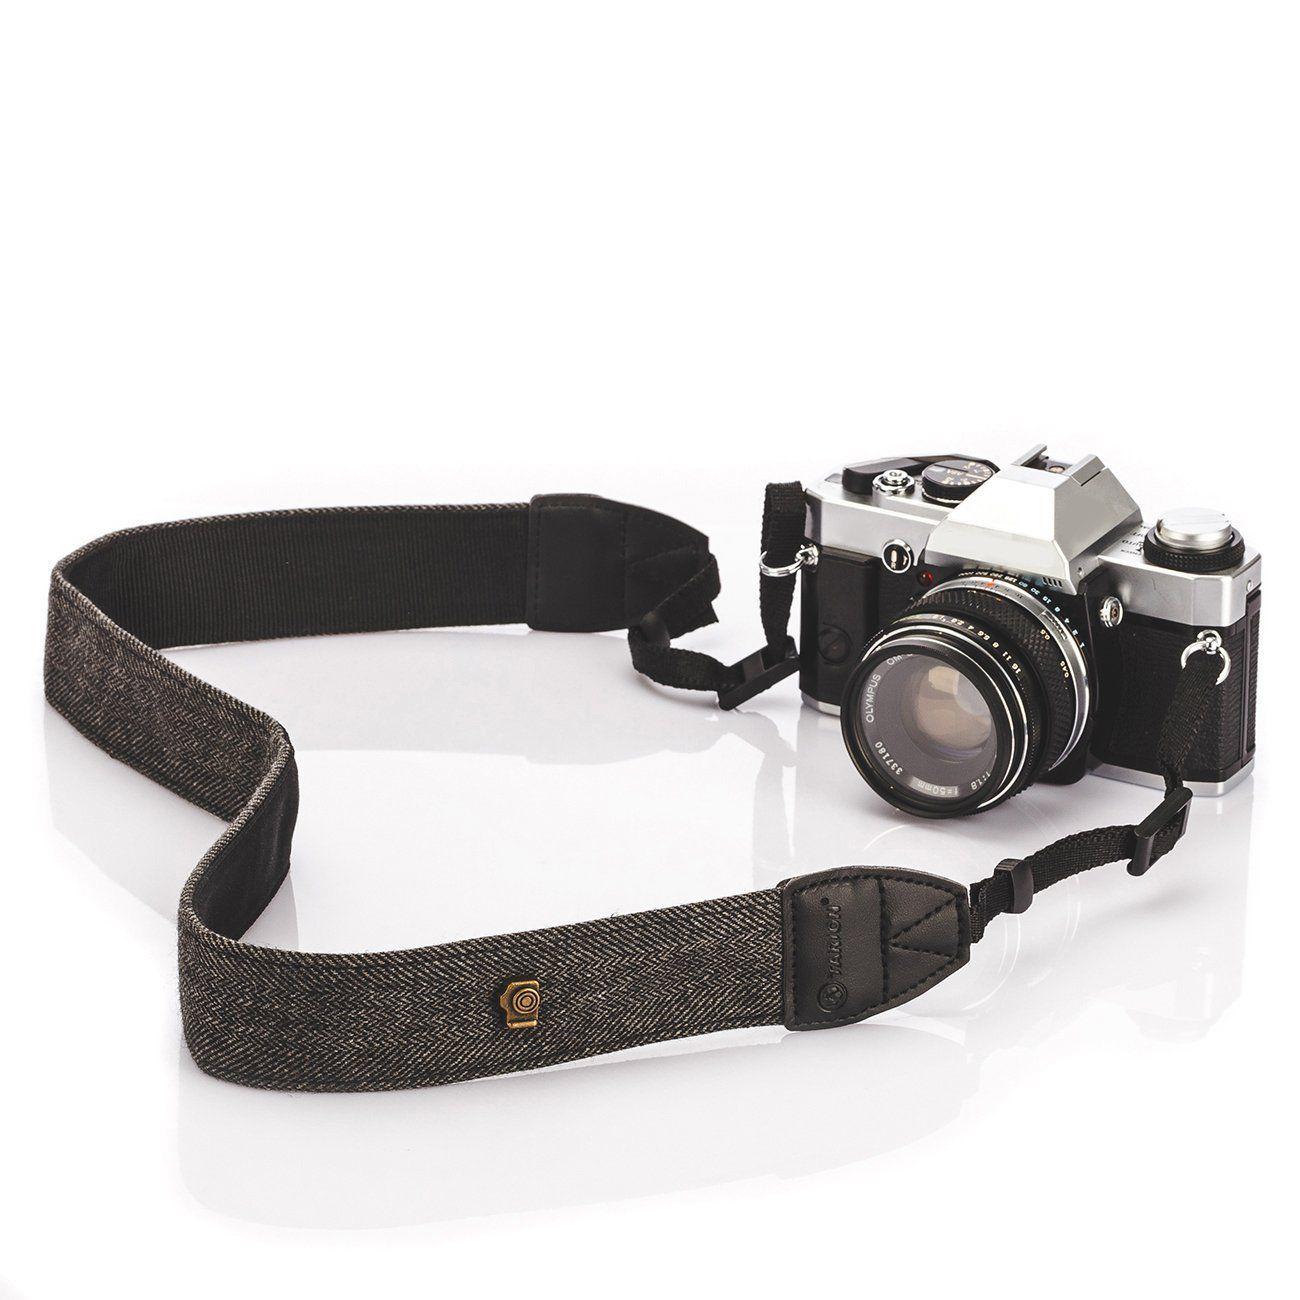 Alça base couro para Camera – Cinza